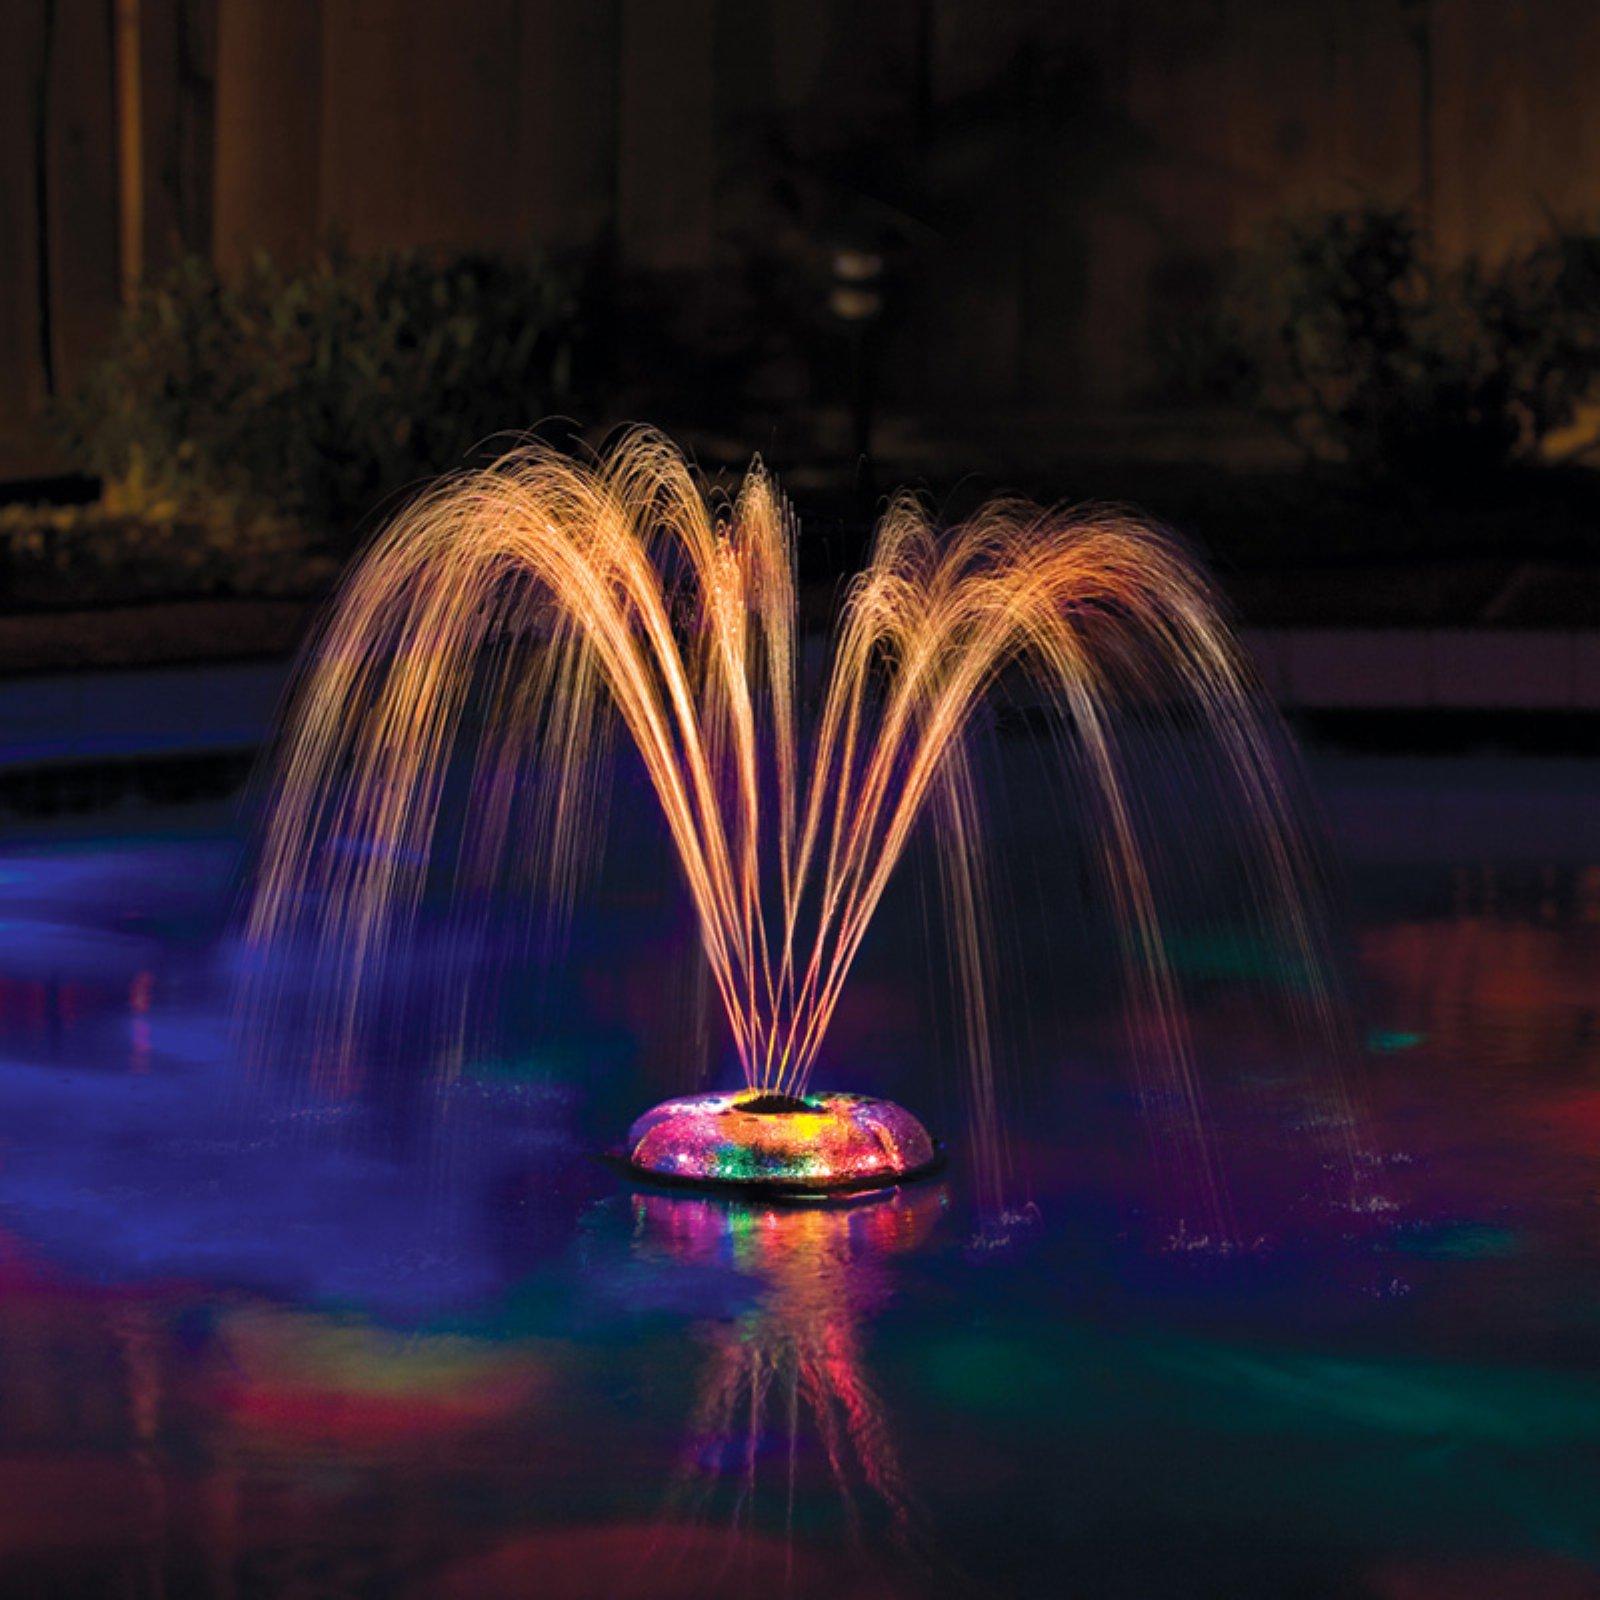 GAME AquaGlow Underwater Light Show Fountain